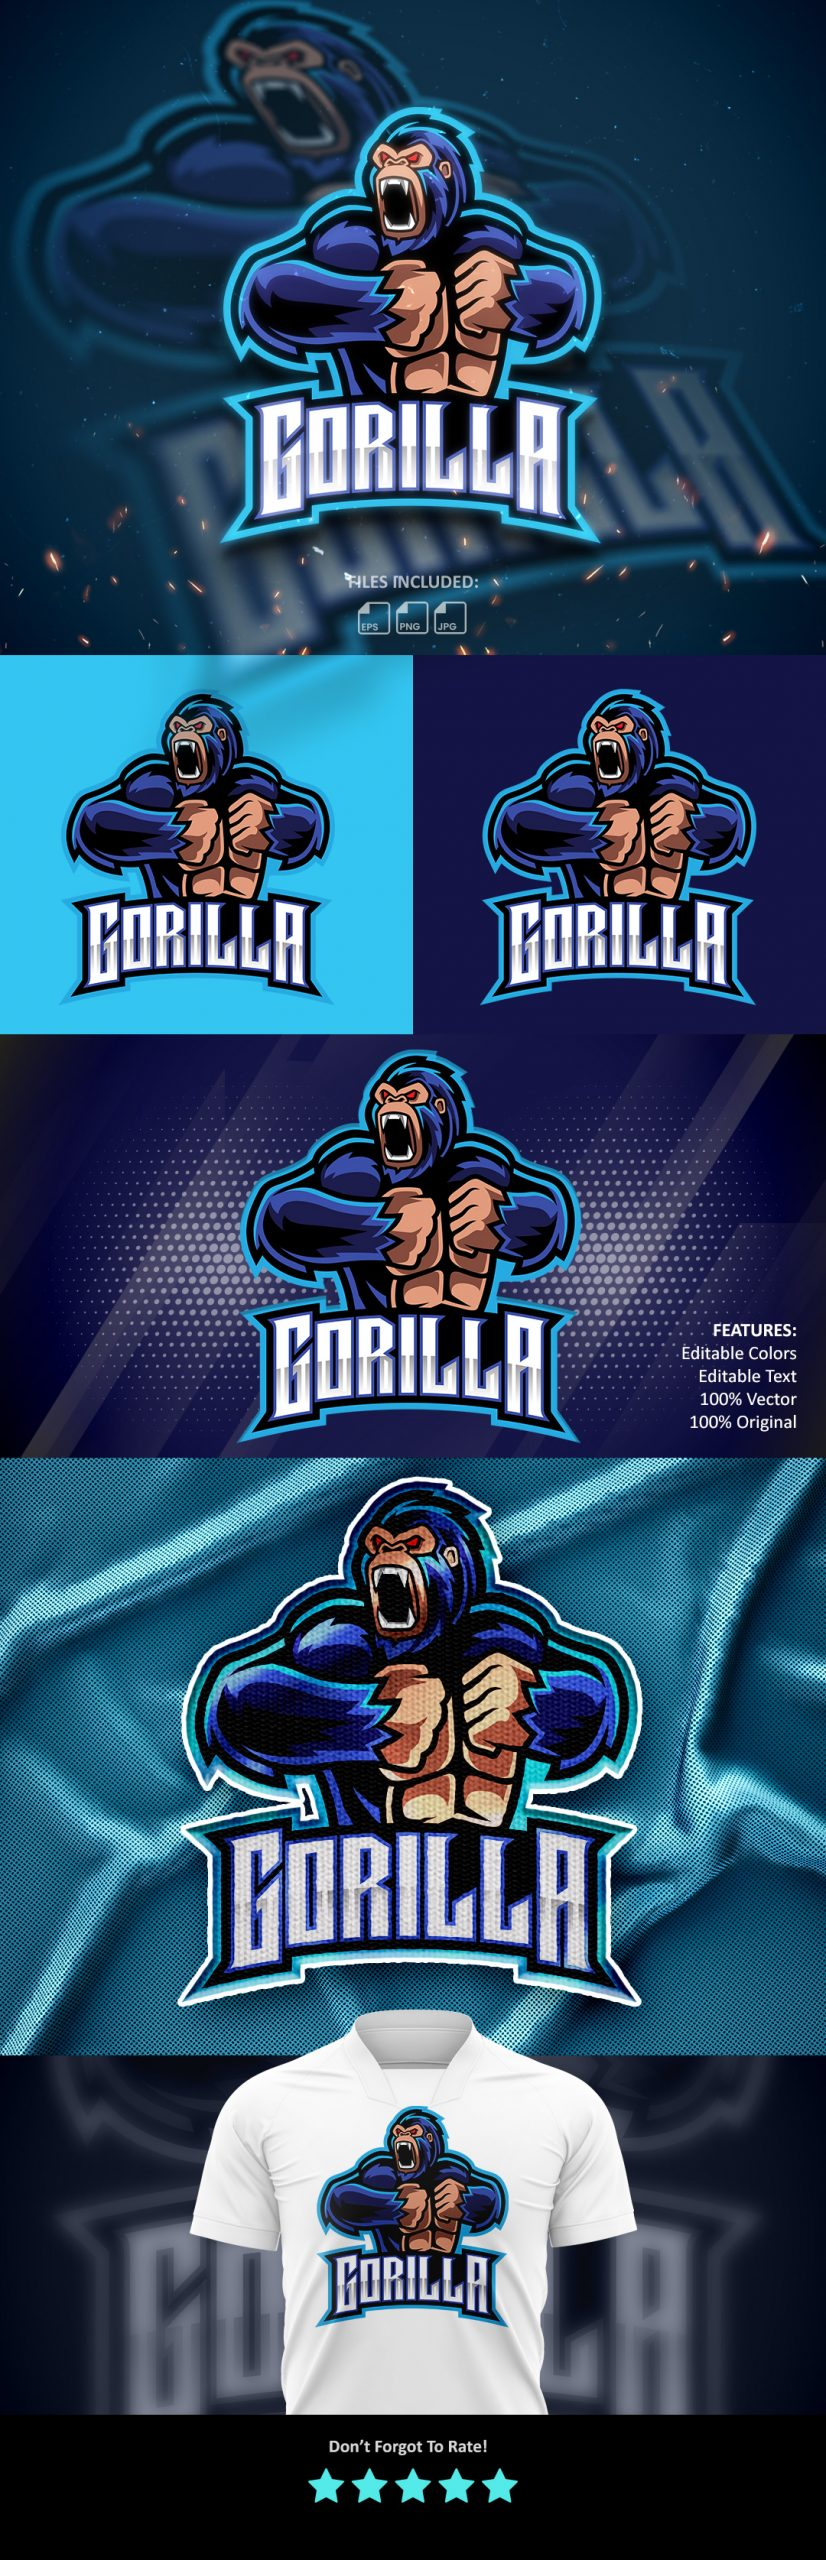 Free-Angry-Gorilla-Esports-Mascot-Logo-Download